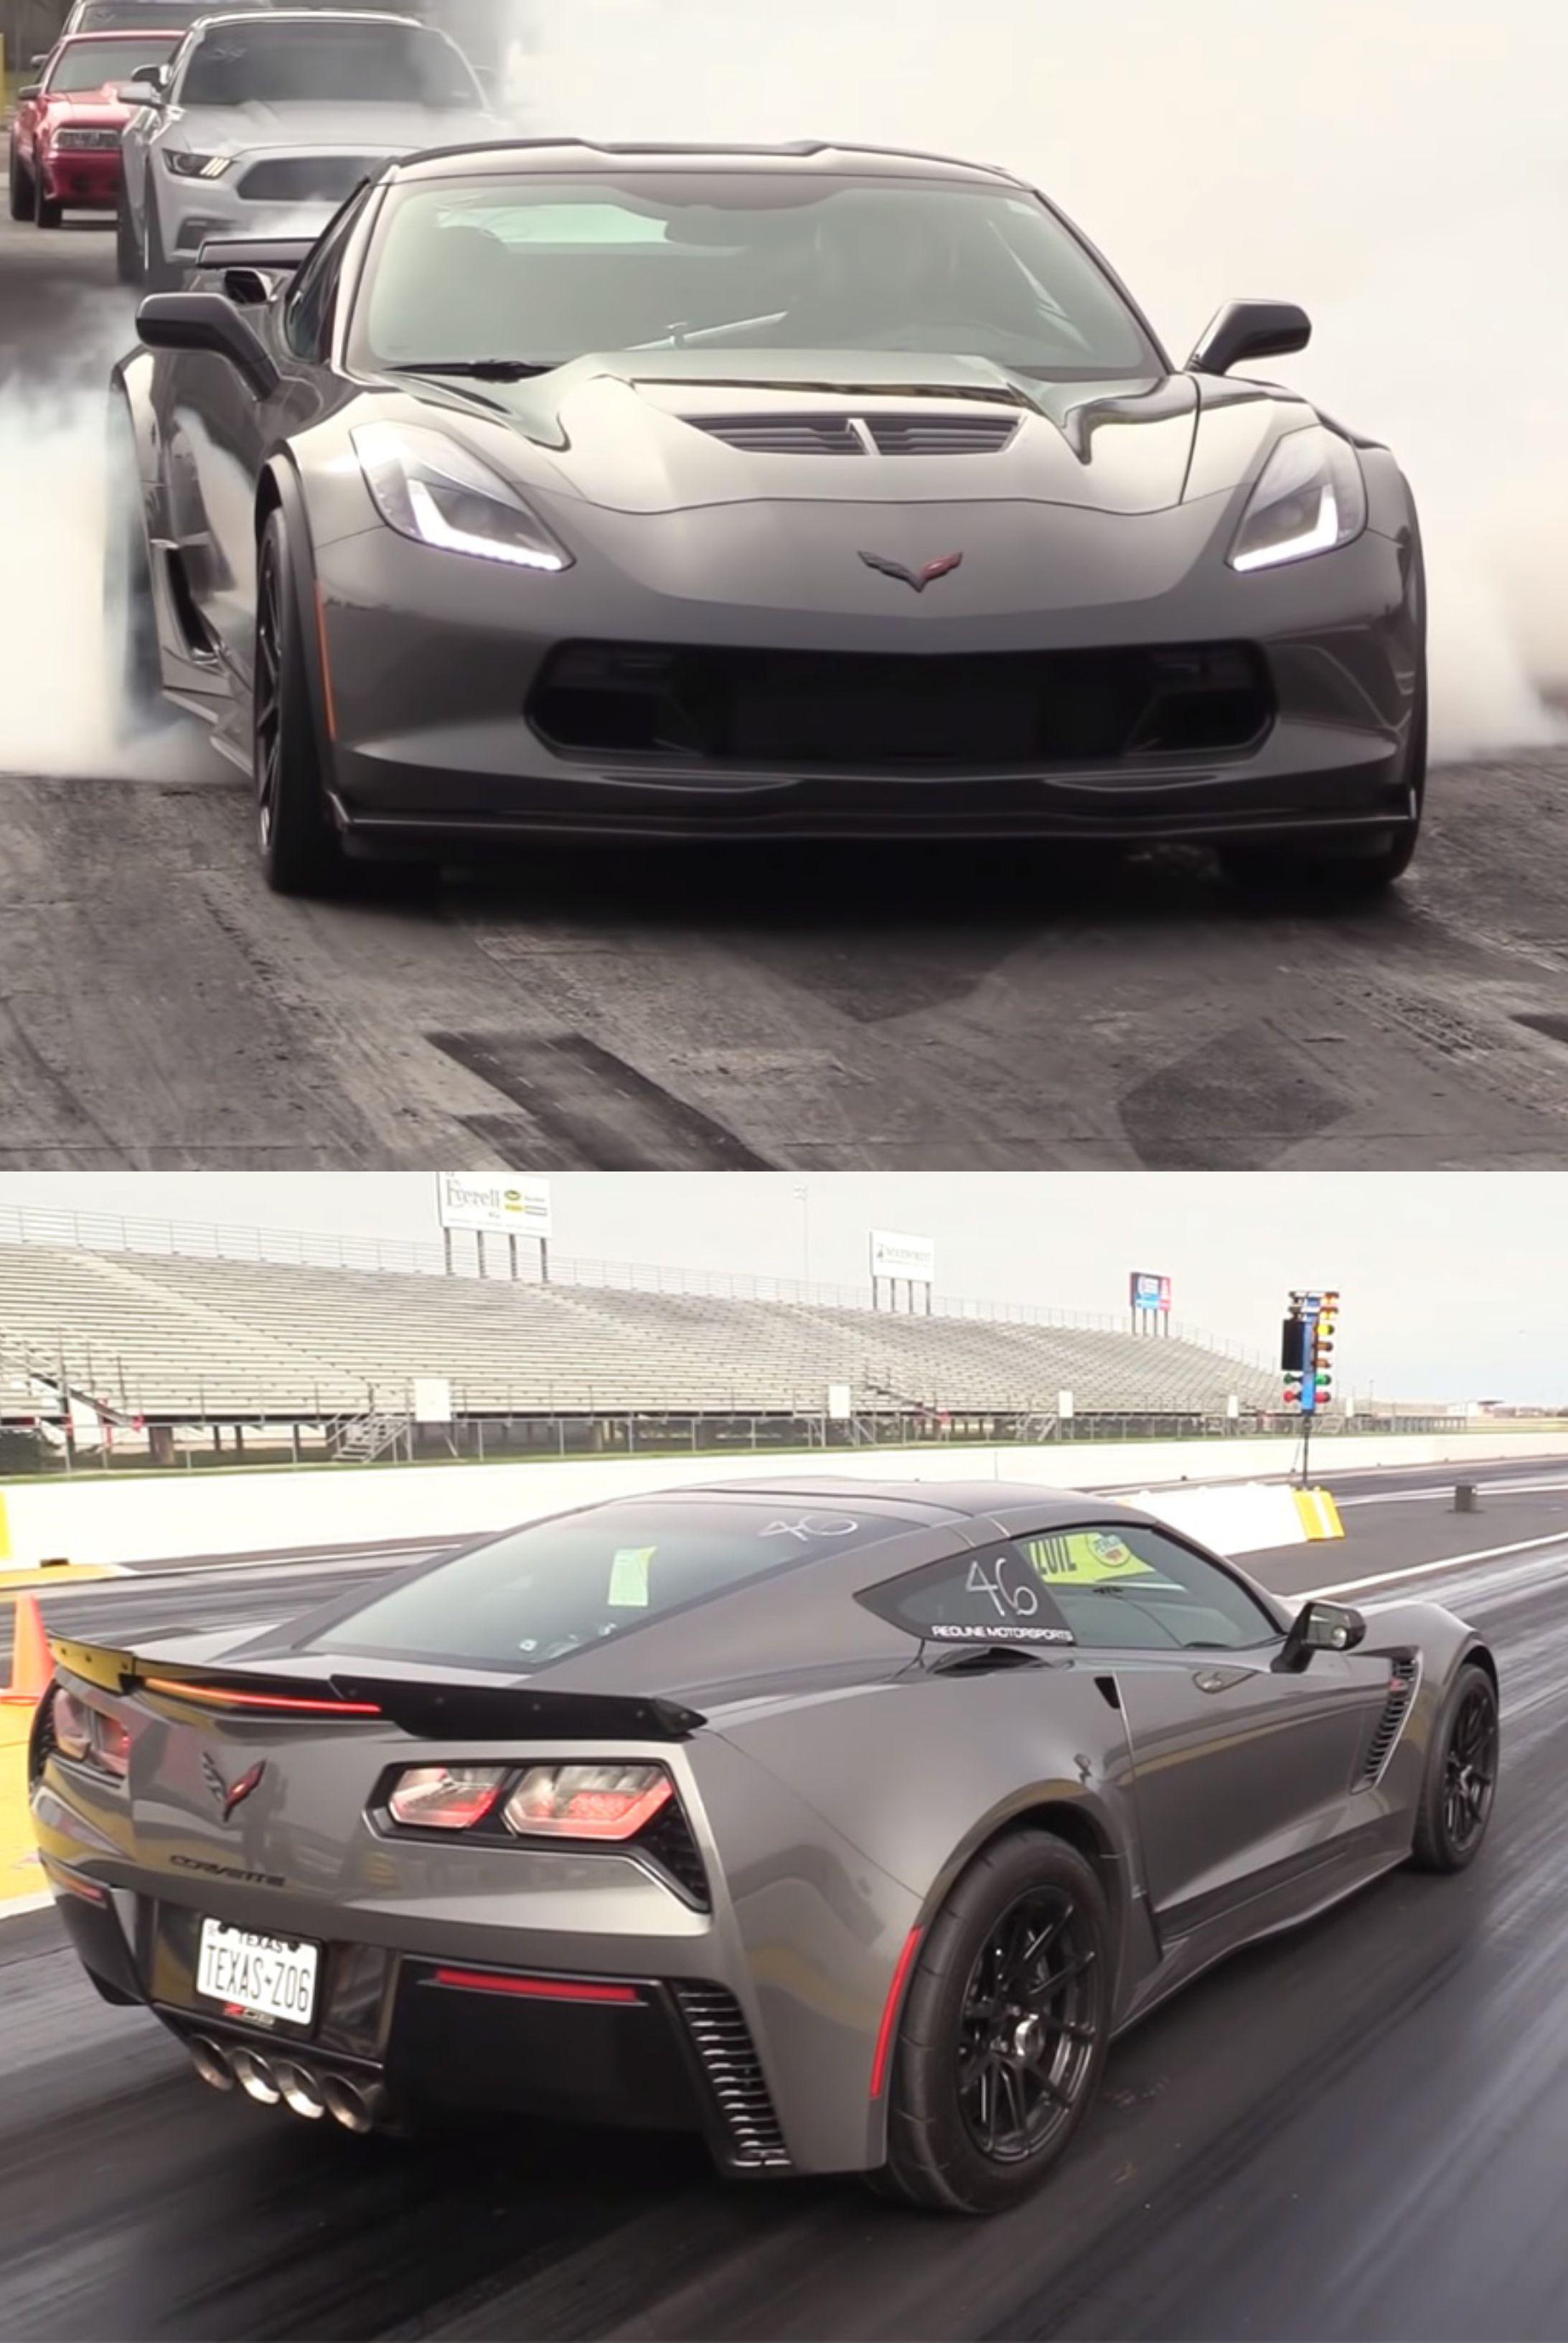 2006 Corvette Z06 Procharged 800hp Hre 540 Wheels 1 4 Mile 10 05